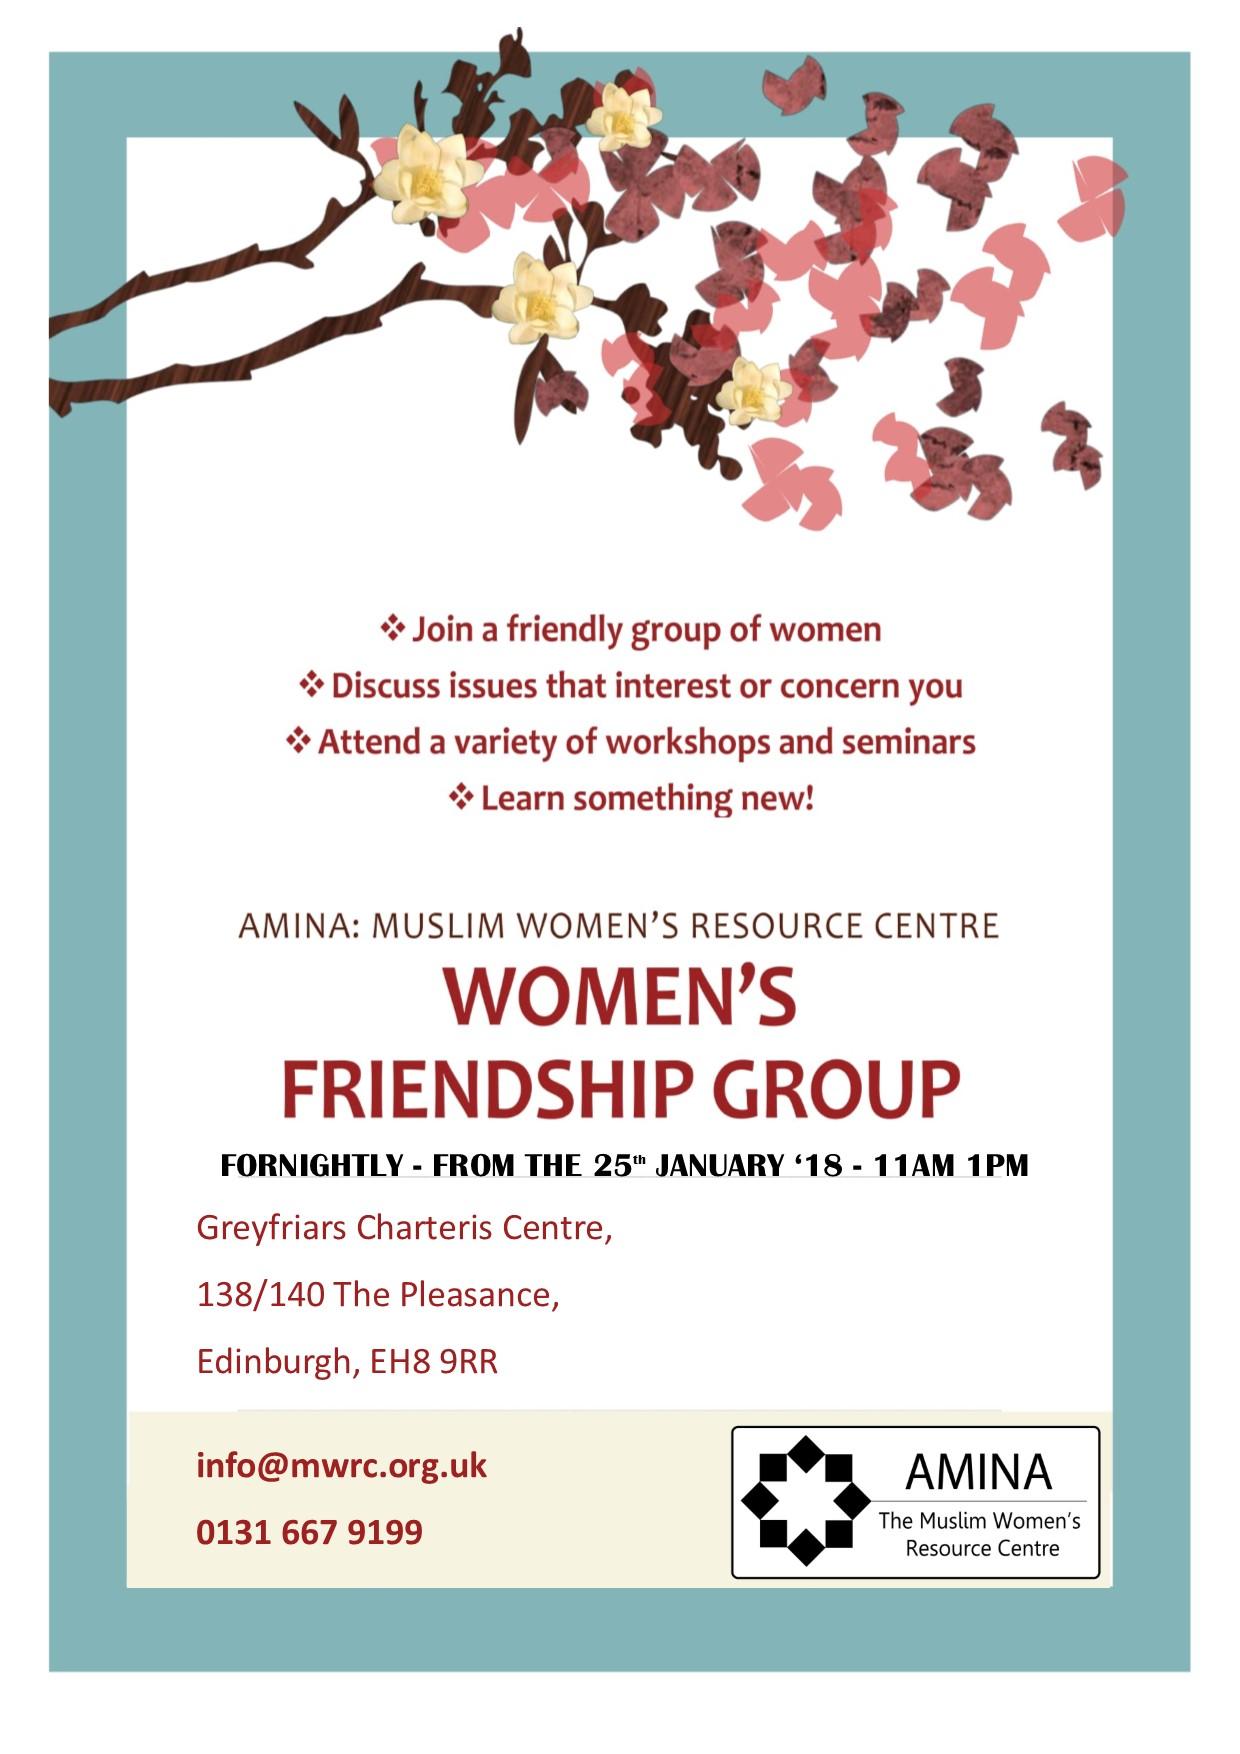 Women's Friendship Group - Edinburgh